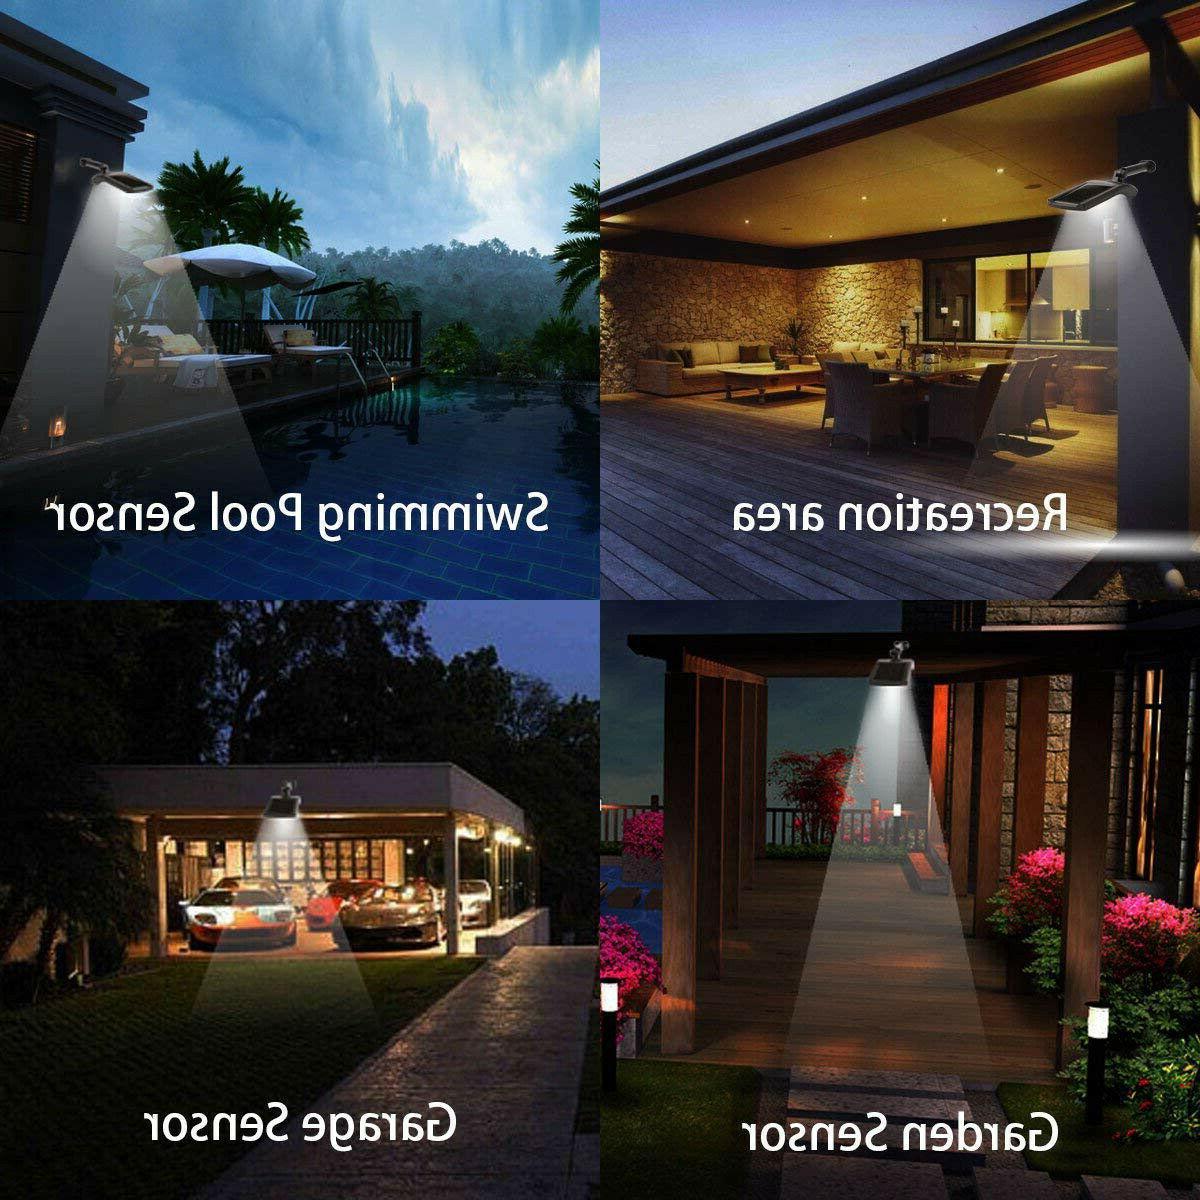 36 LED Motion Wall Outdoor Waterproof Garden Lamp